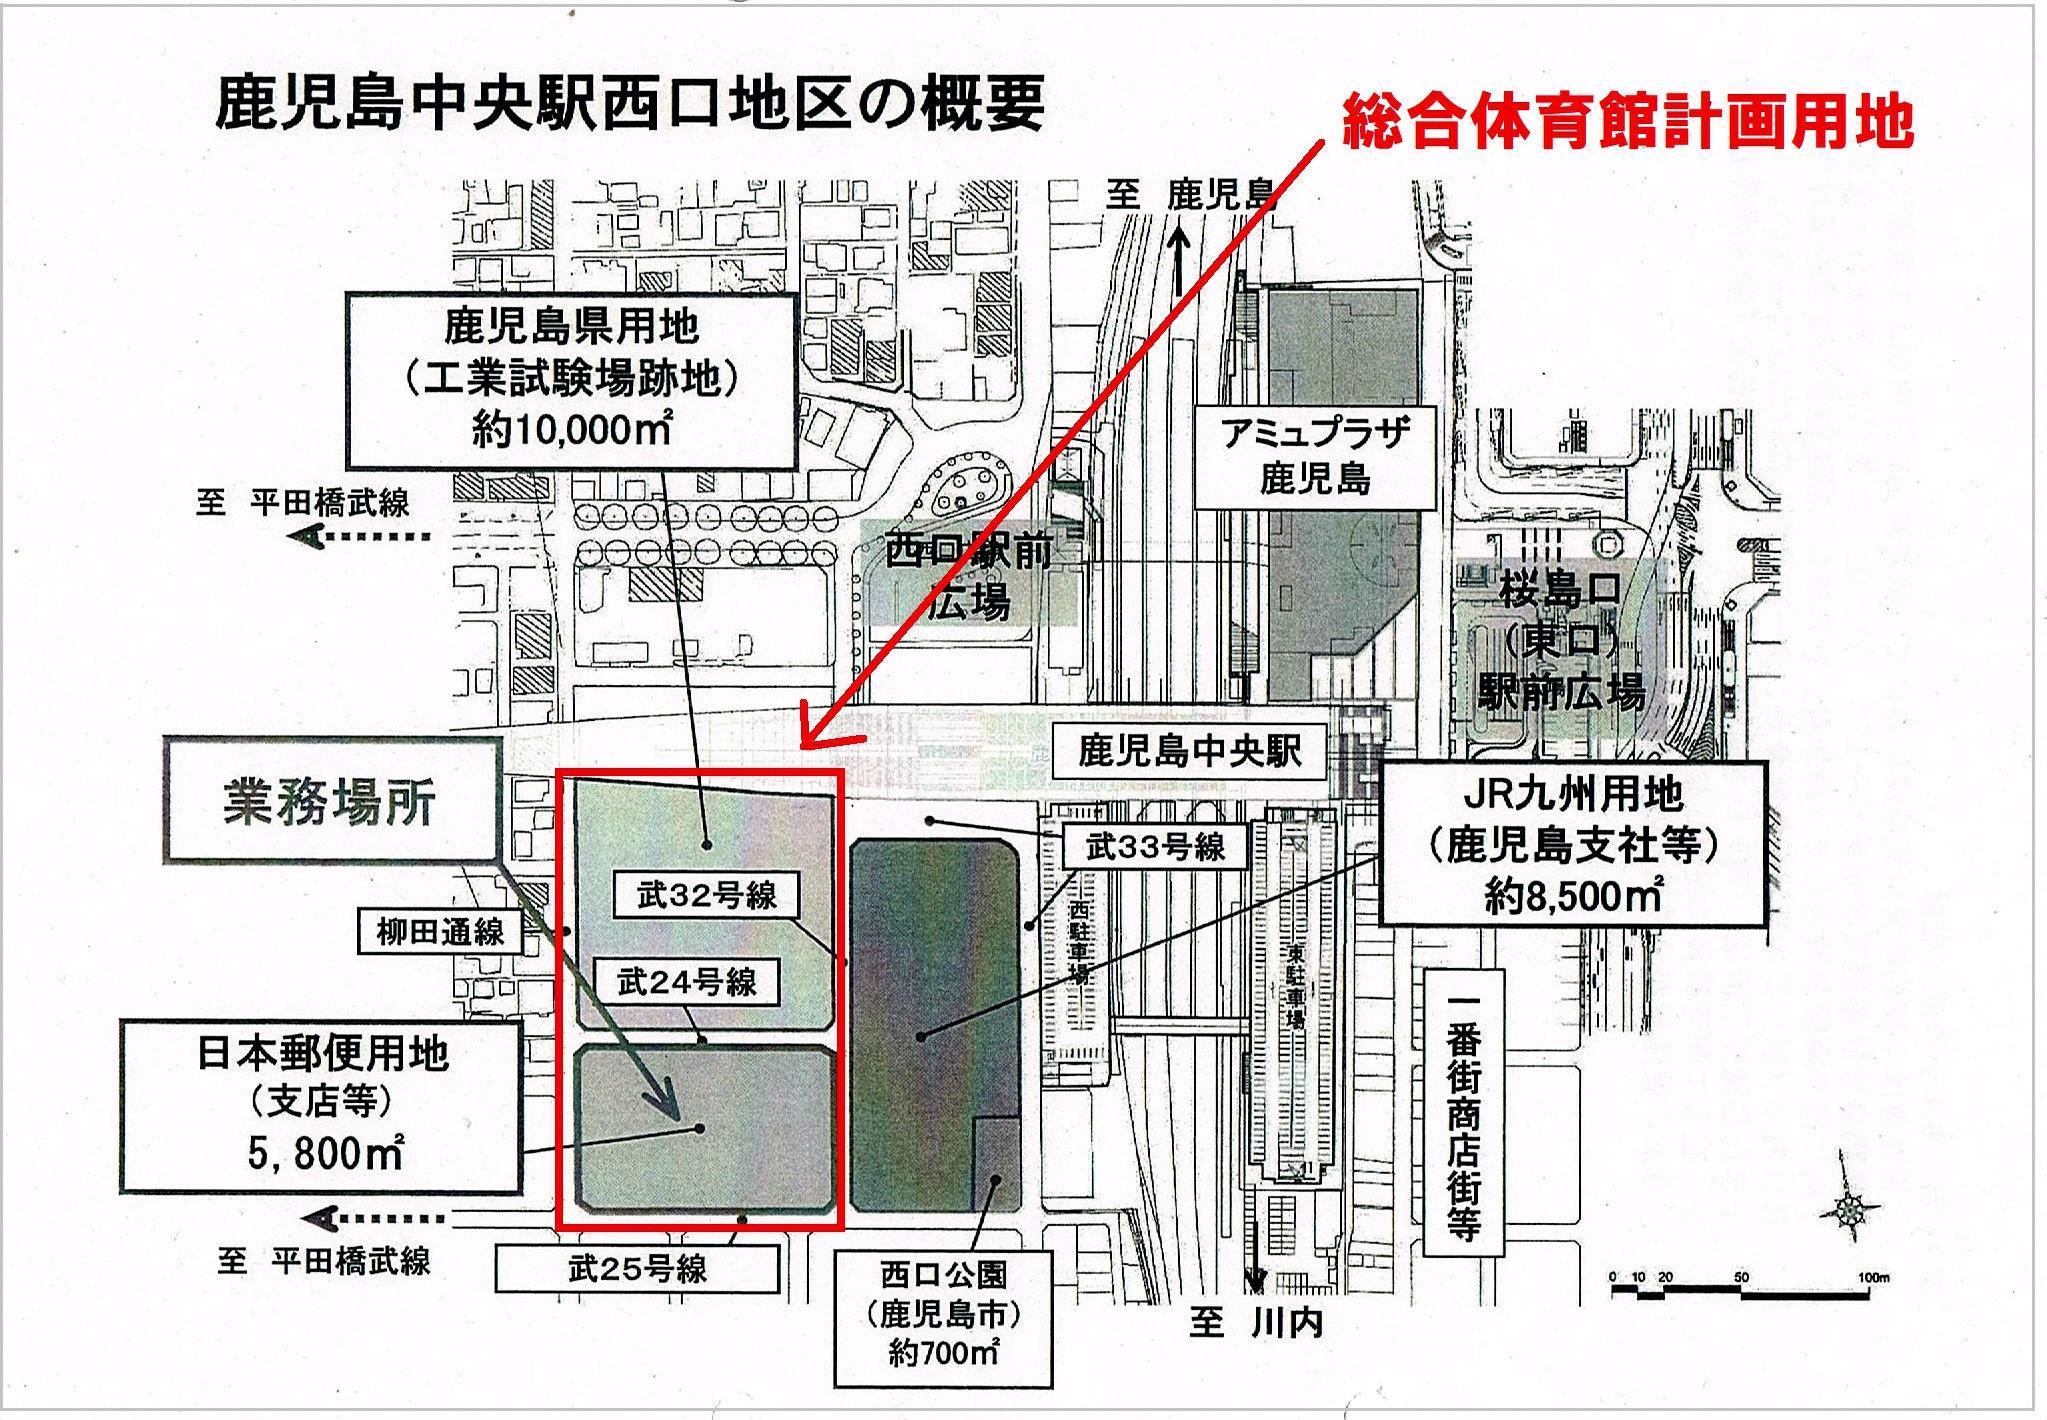 http://hunter-investigate.jp/news/197bdc9845b54c565b9365d65184ebbb3ff4f795.jpg